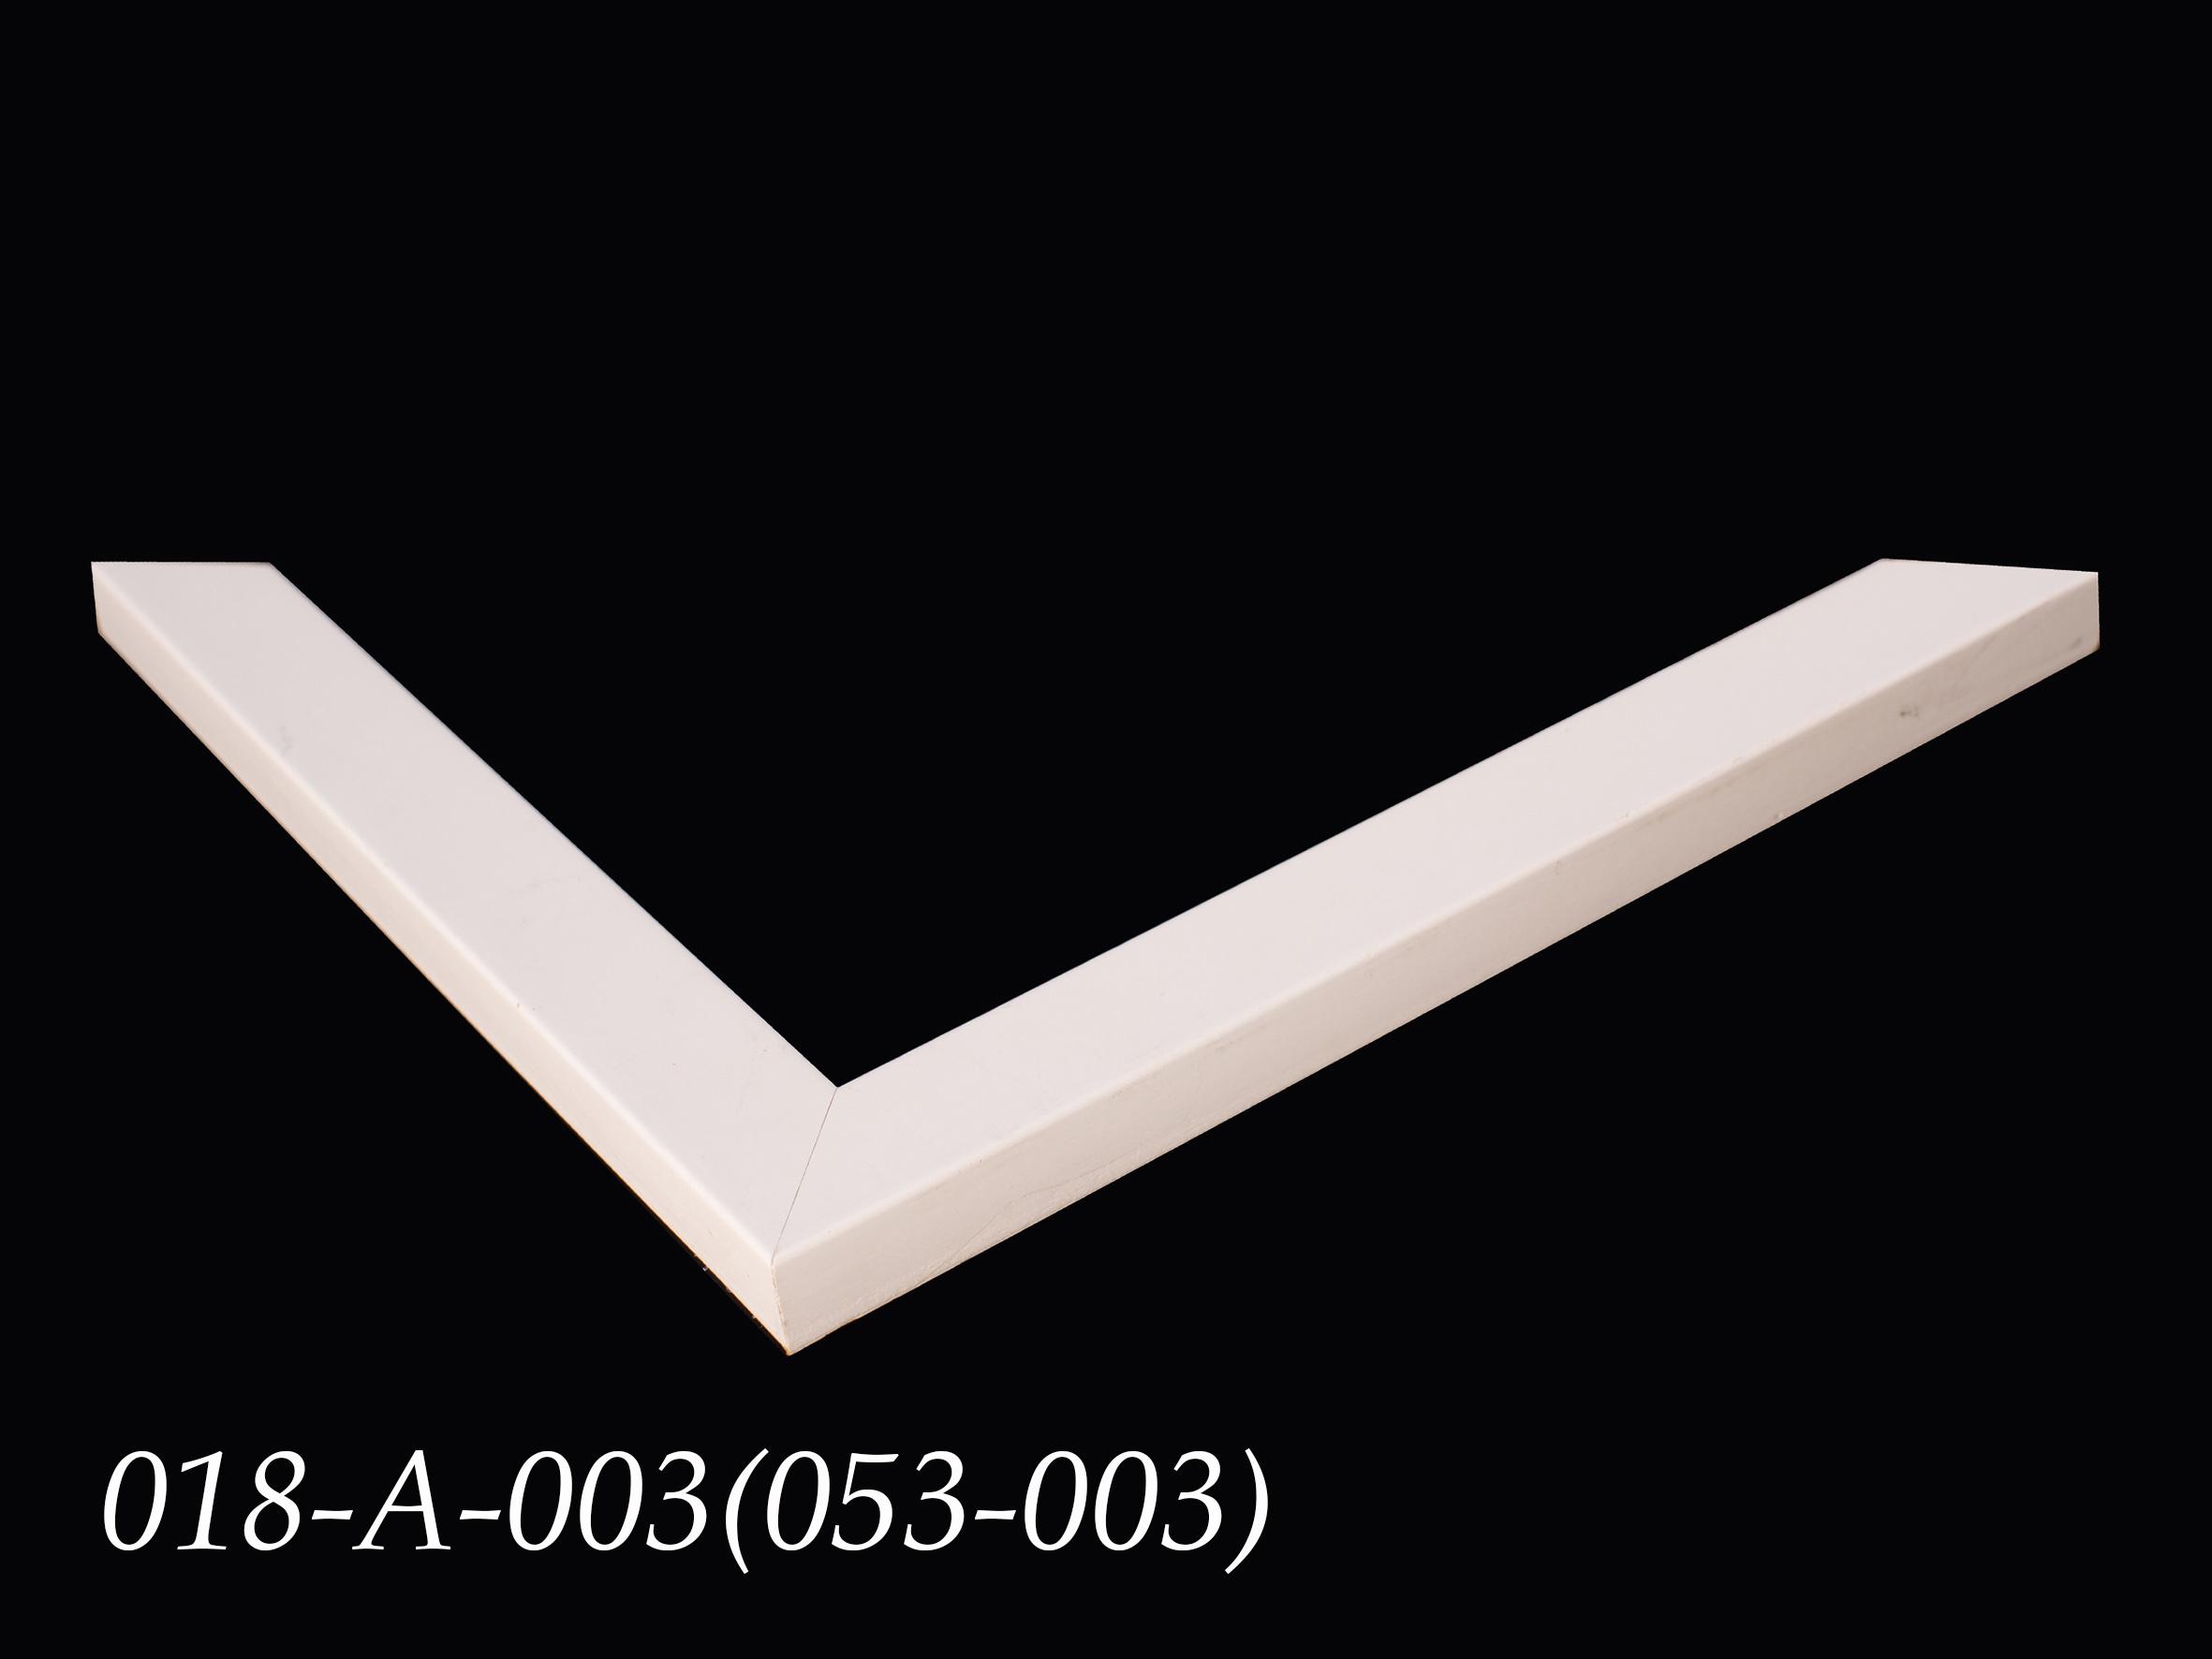 018-A-003-053-003